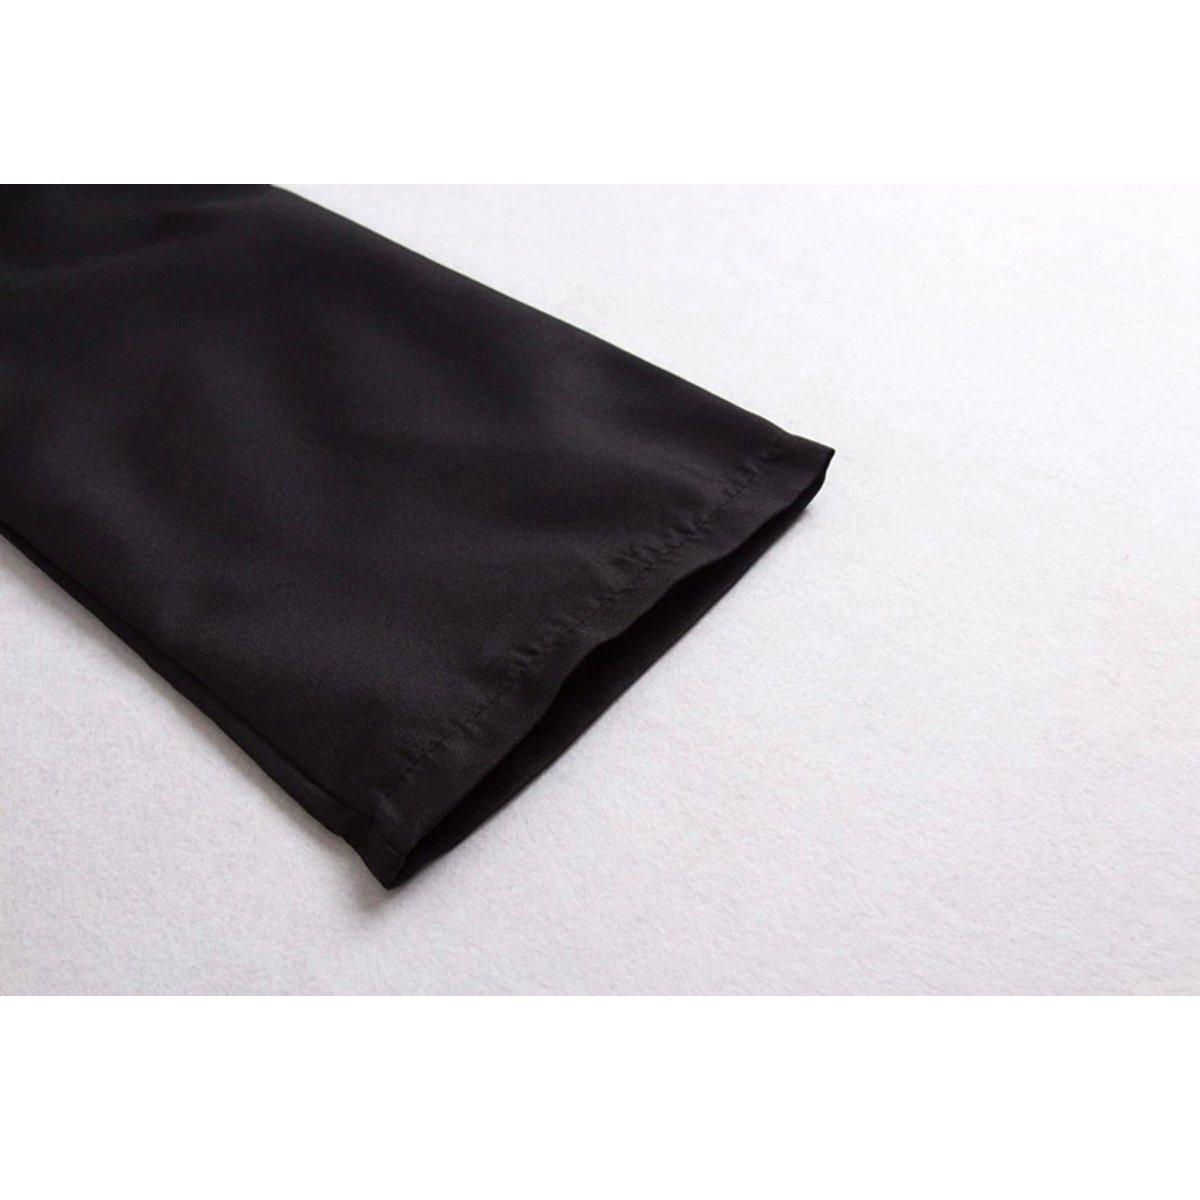 Angelaicos Unisex Black Hoodie Robe Halloween Party Costume Cloak with Headband